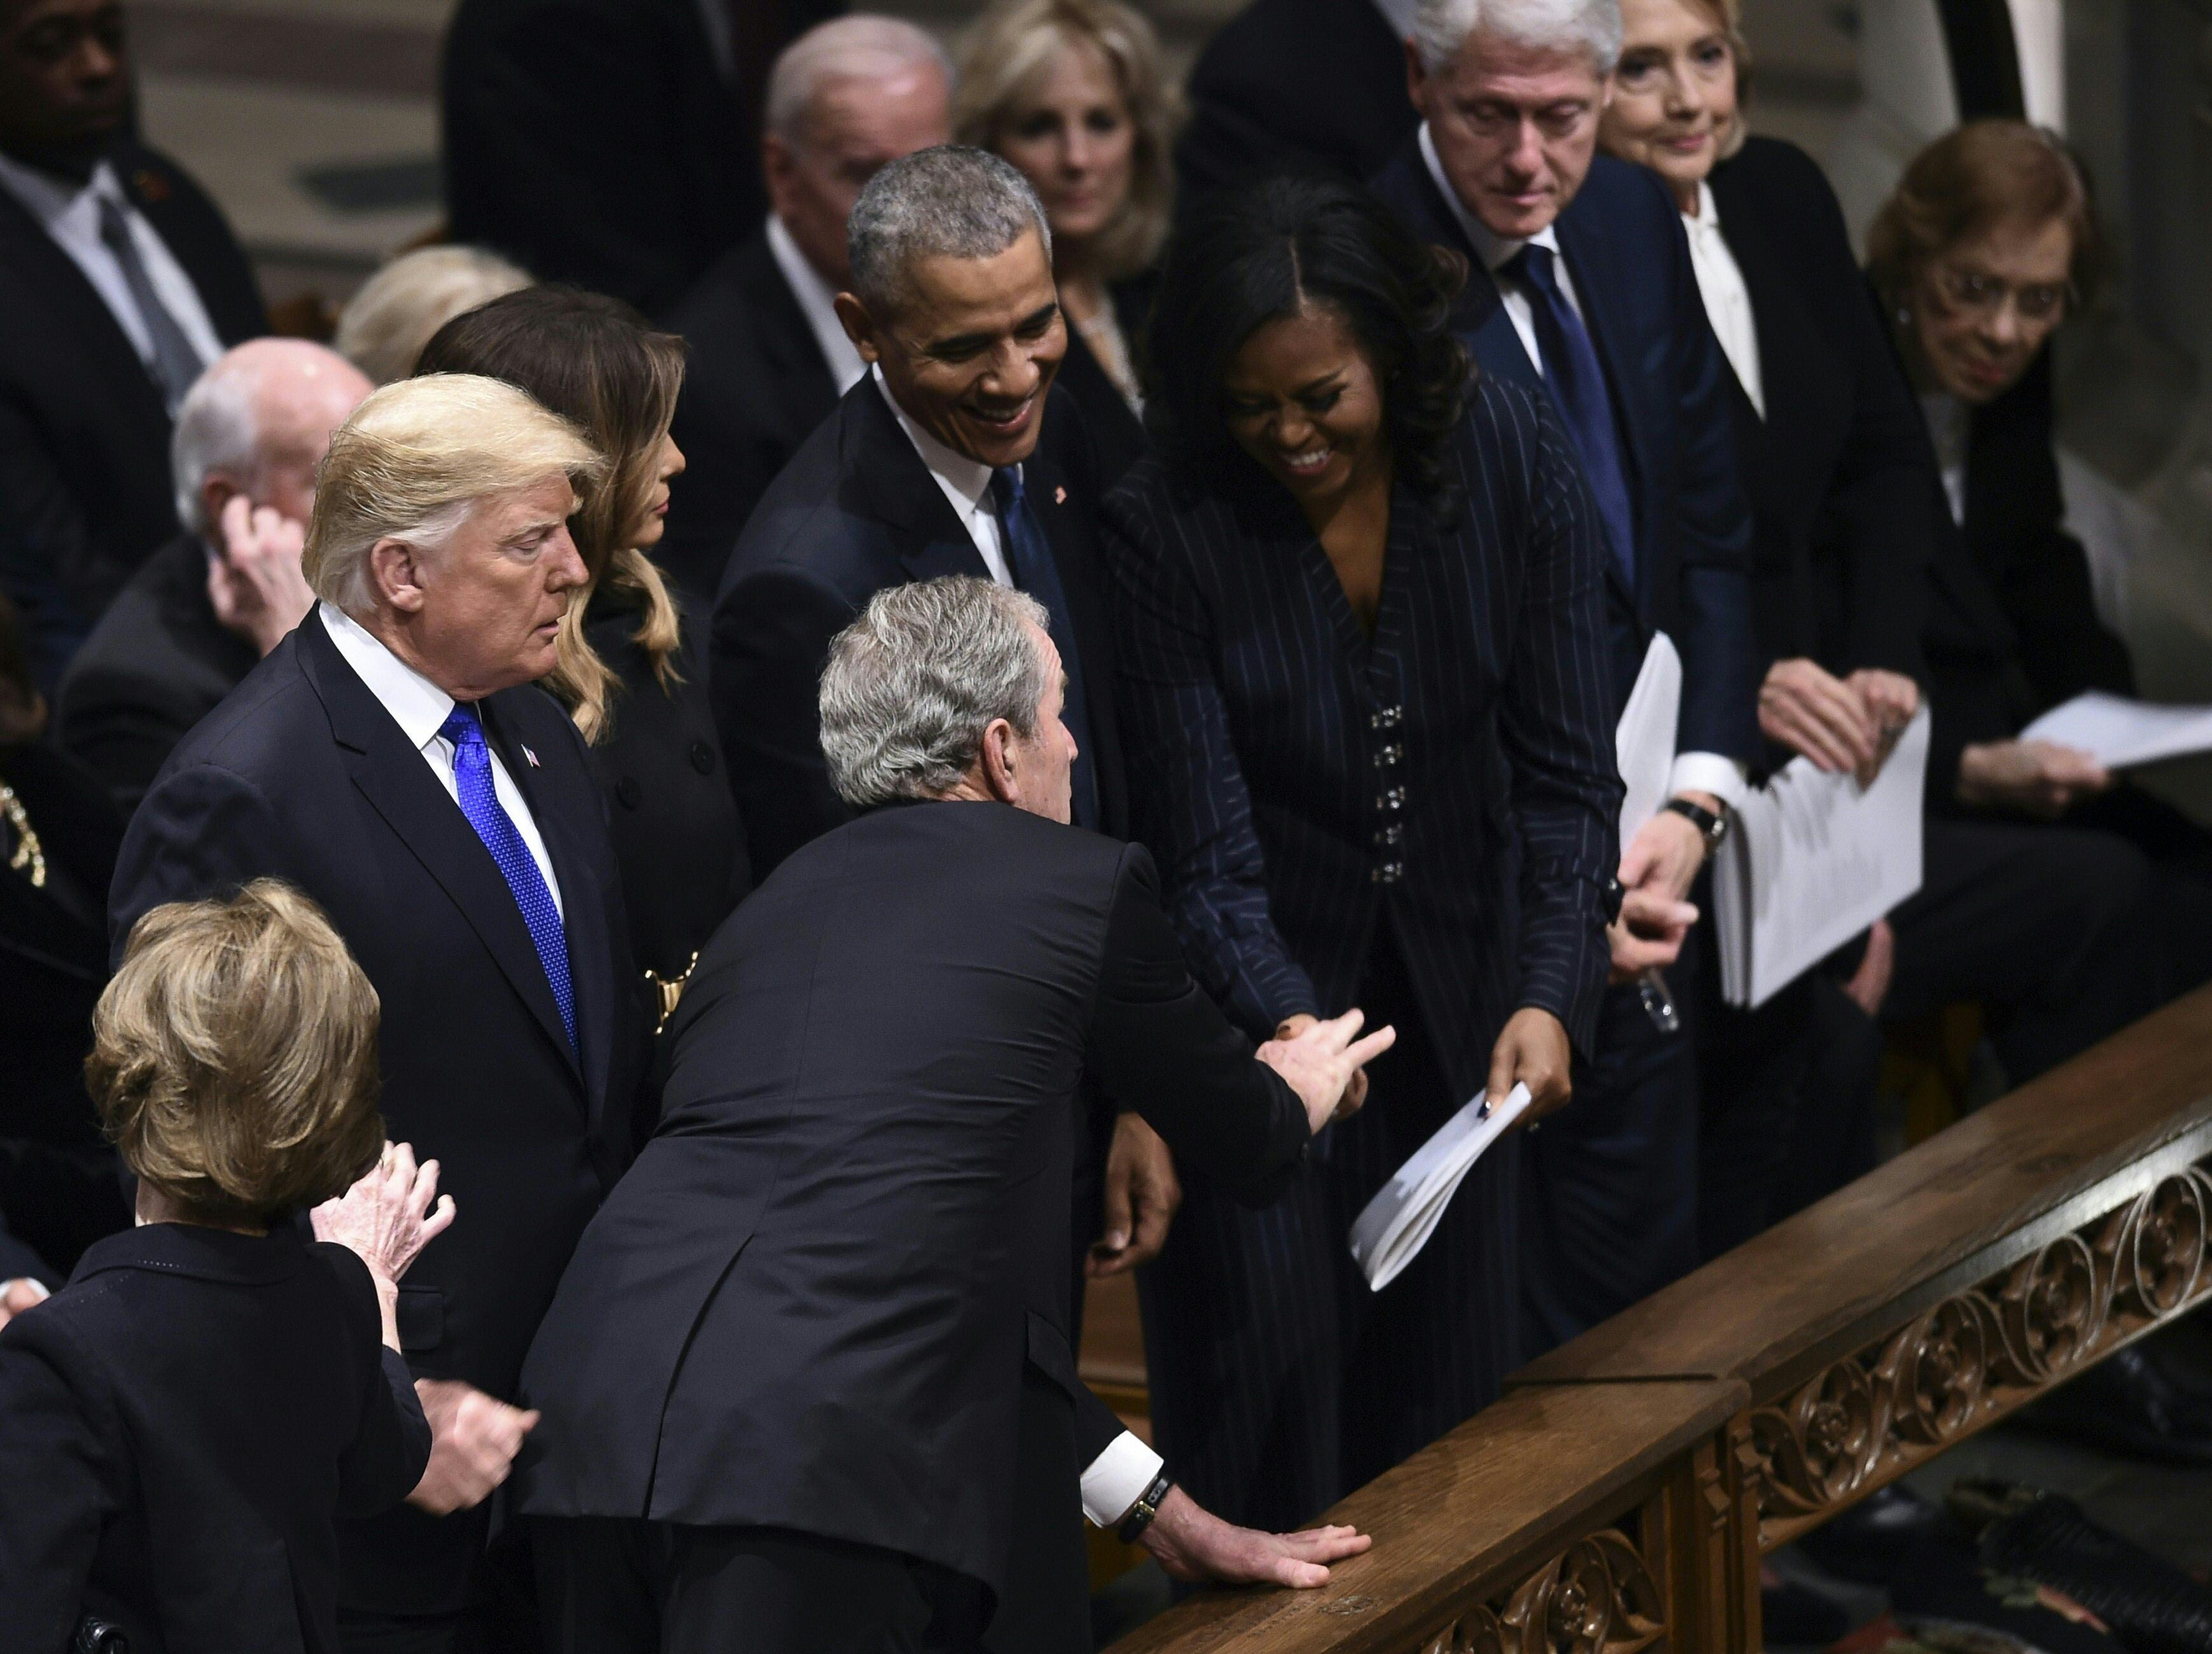 US-POLITICS-BUSH